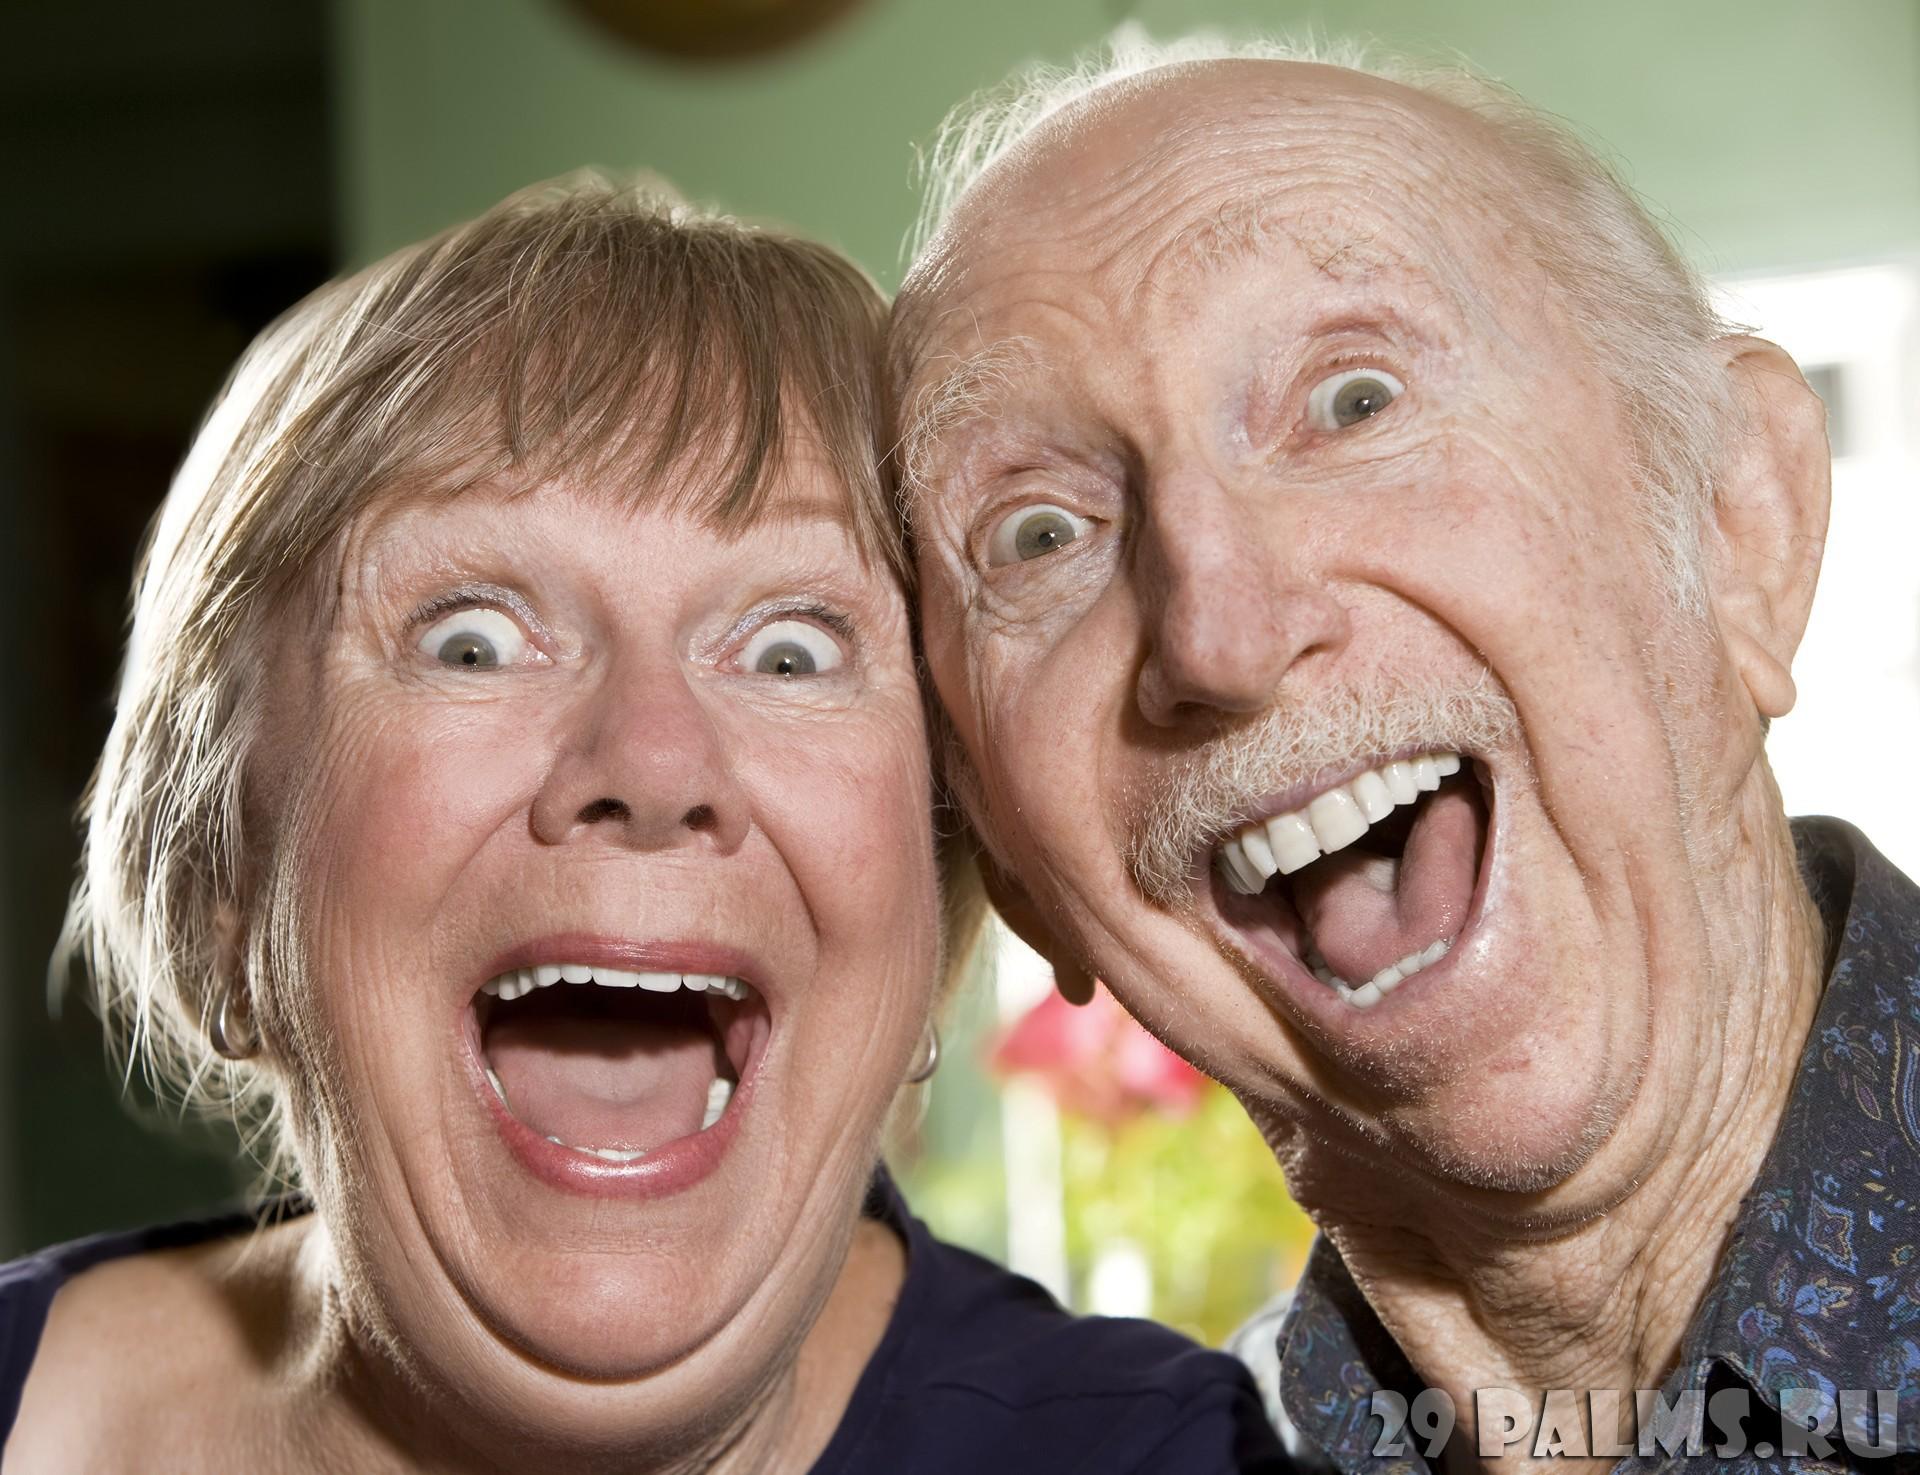 Тетя с любовником фото 21 фотография